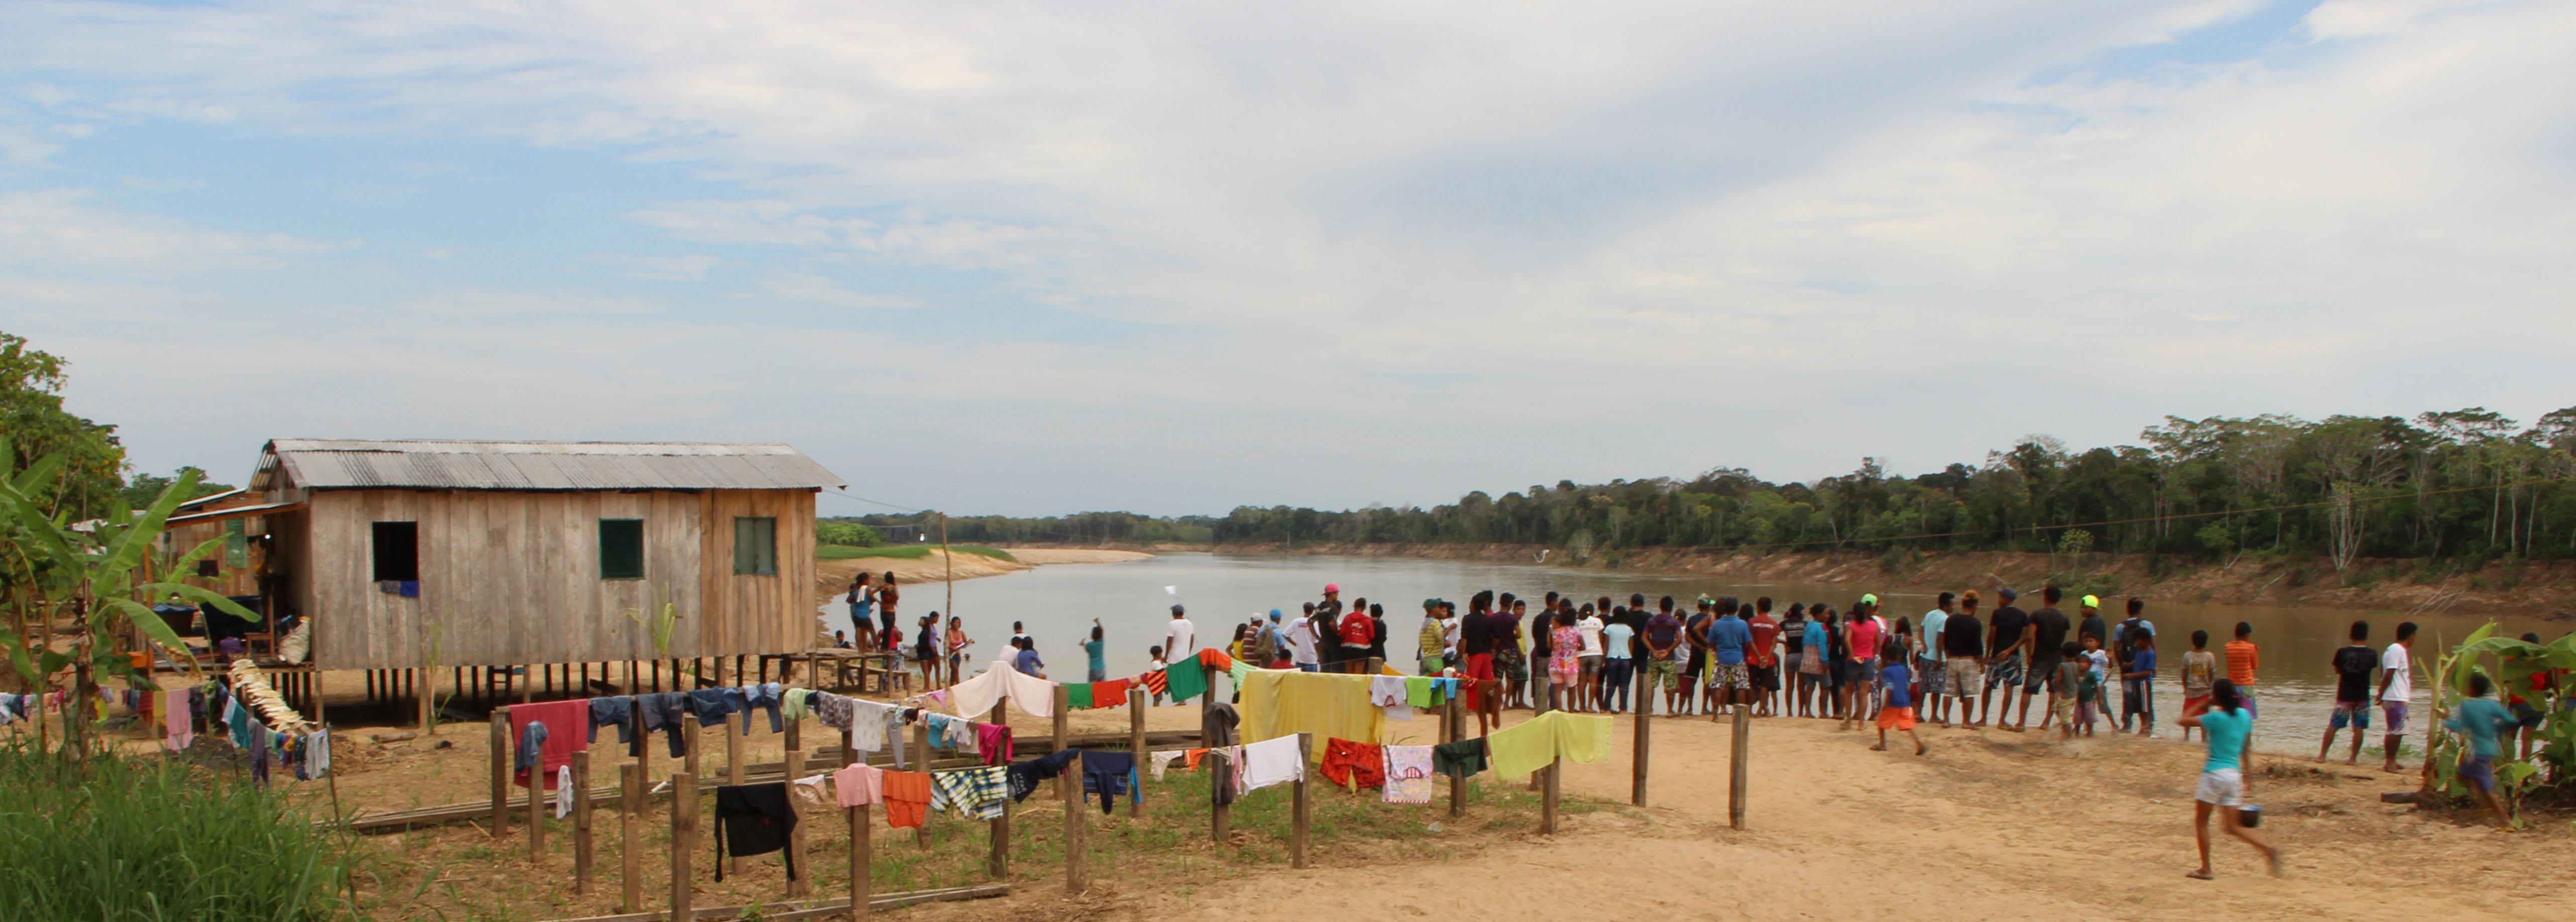 Aldeia indígena São Clemente do povo paumari (Foto: Oiara Bonilla)